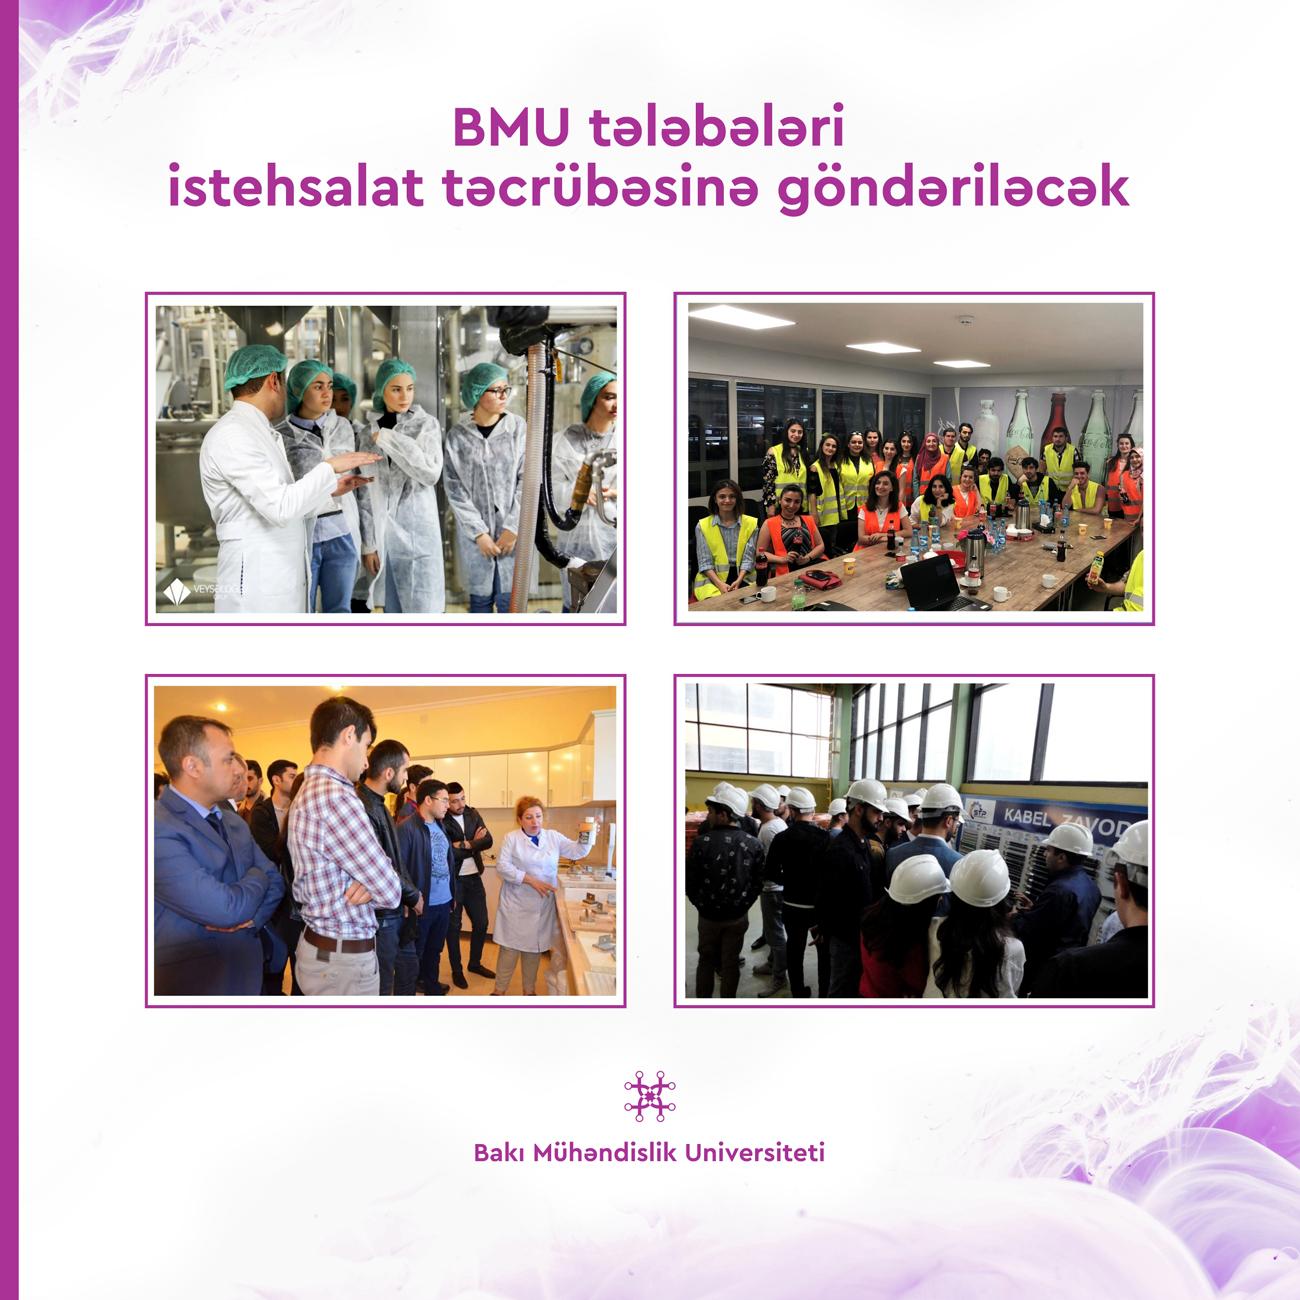 734 BEU students will have internship